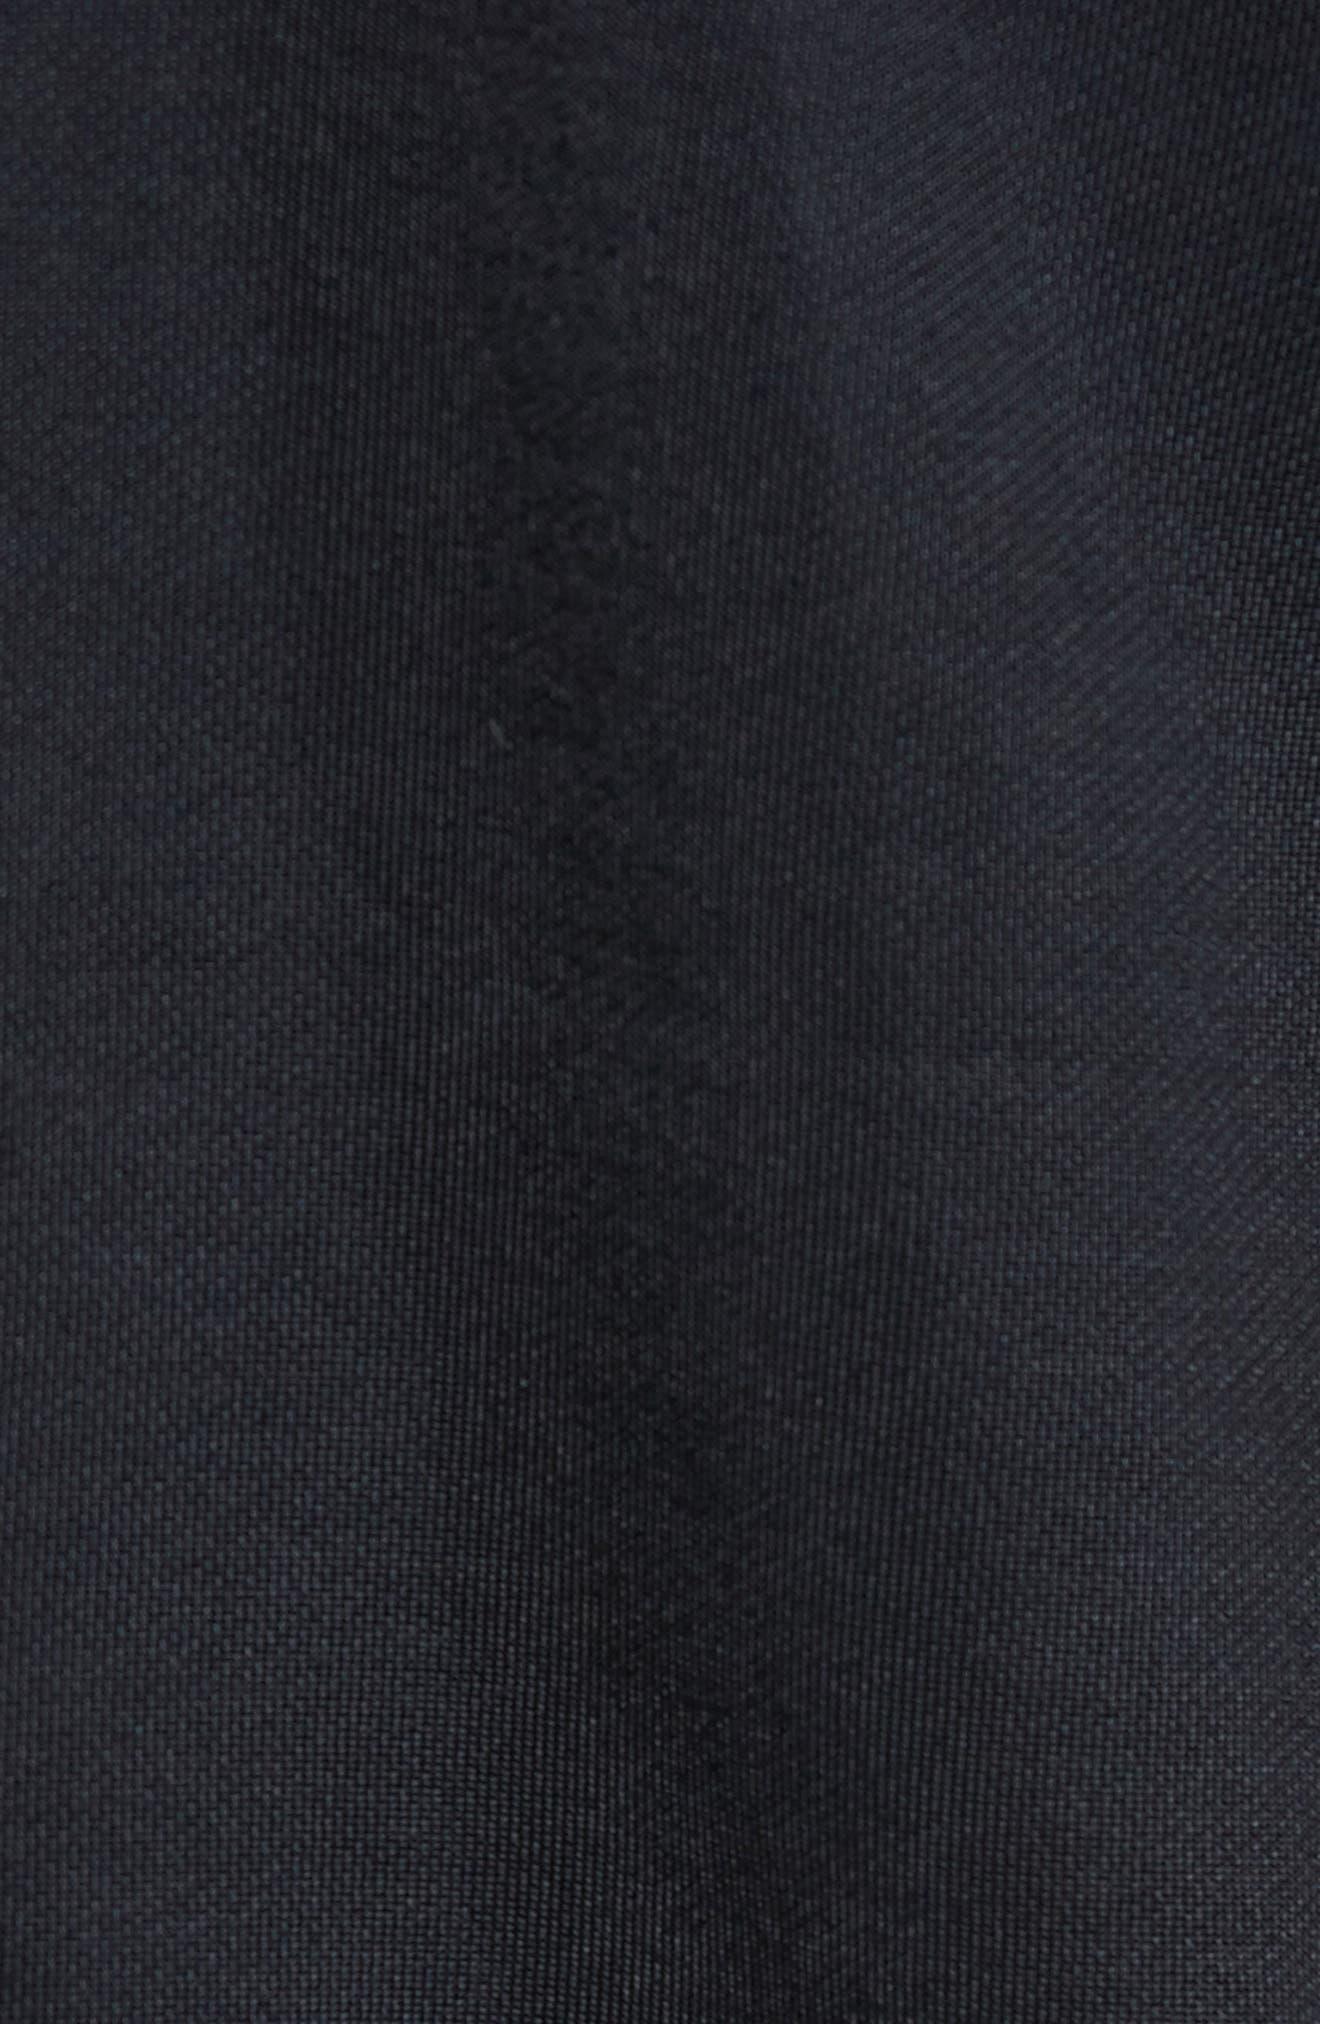 Regular Fit Zip Hoodie,                             Alternate thumbnail 5, color,                             New Coastal